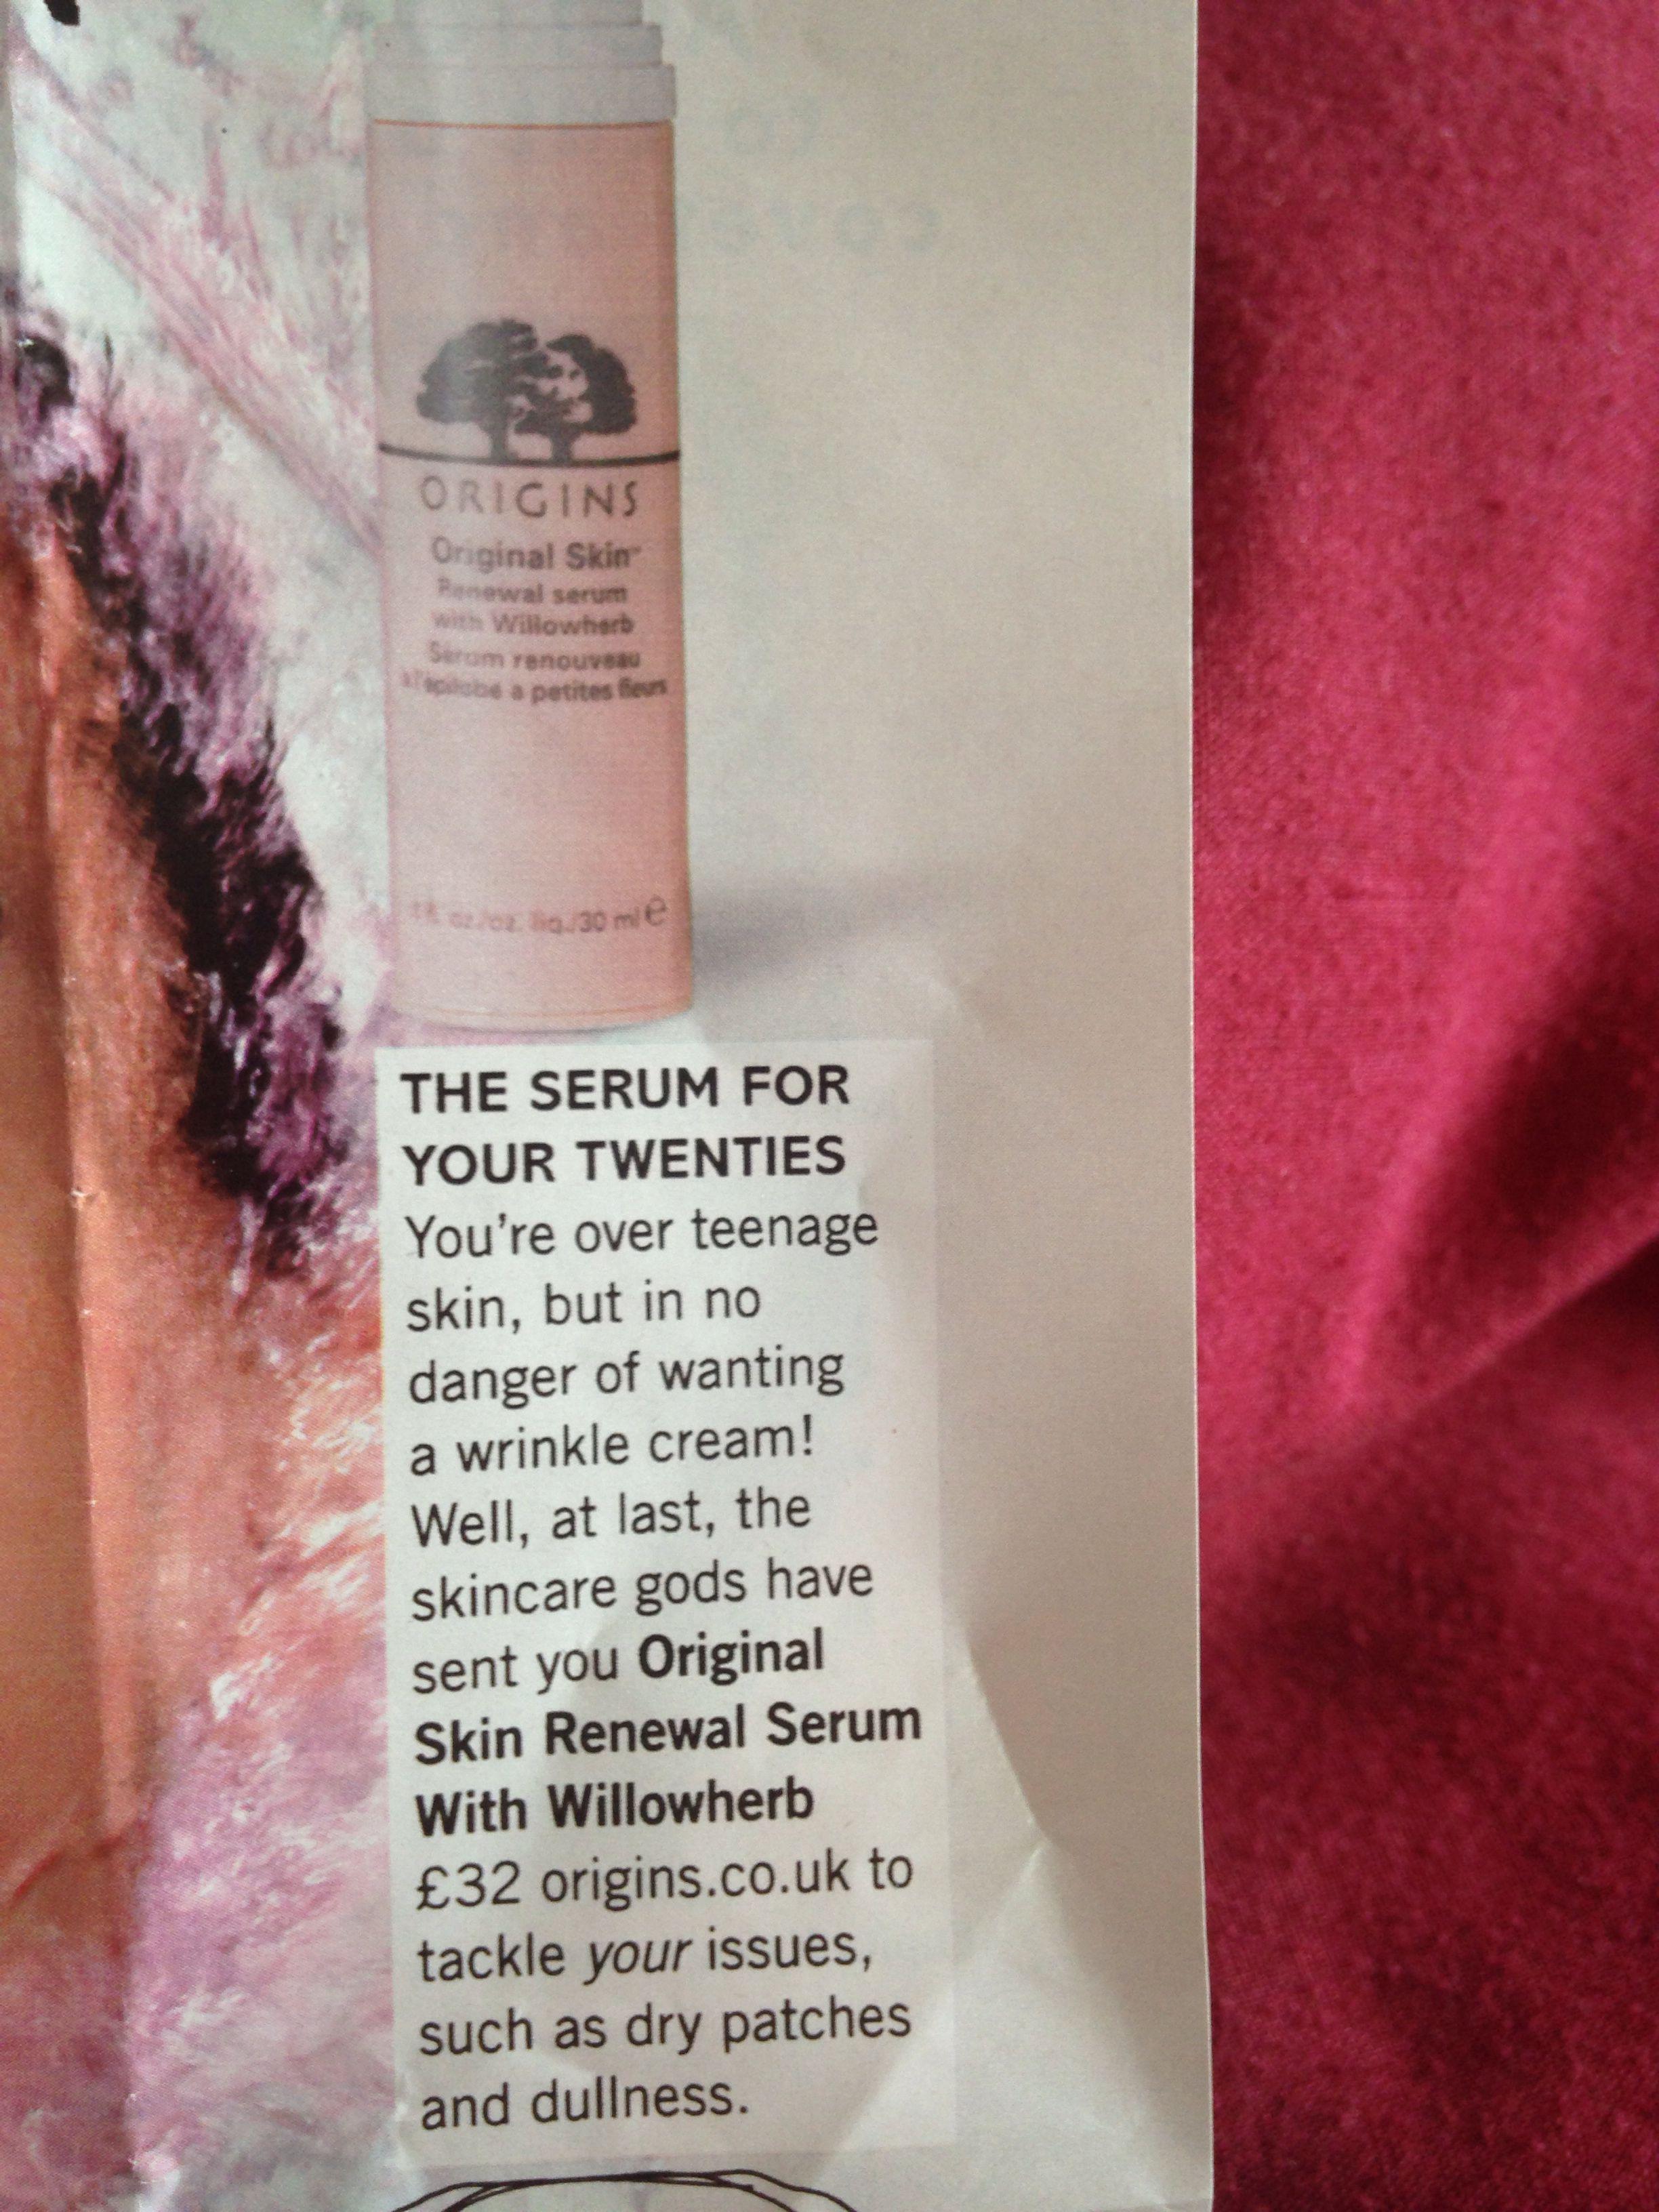 Origins skin renewal serum with willow herb £32